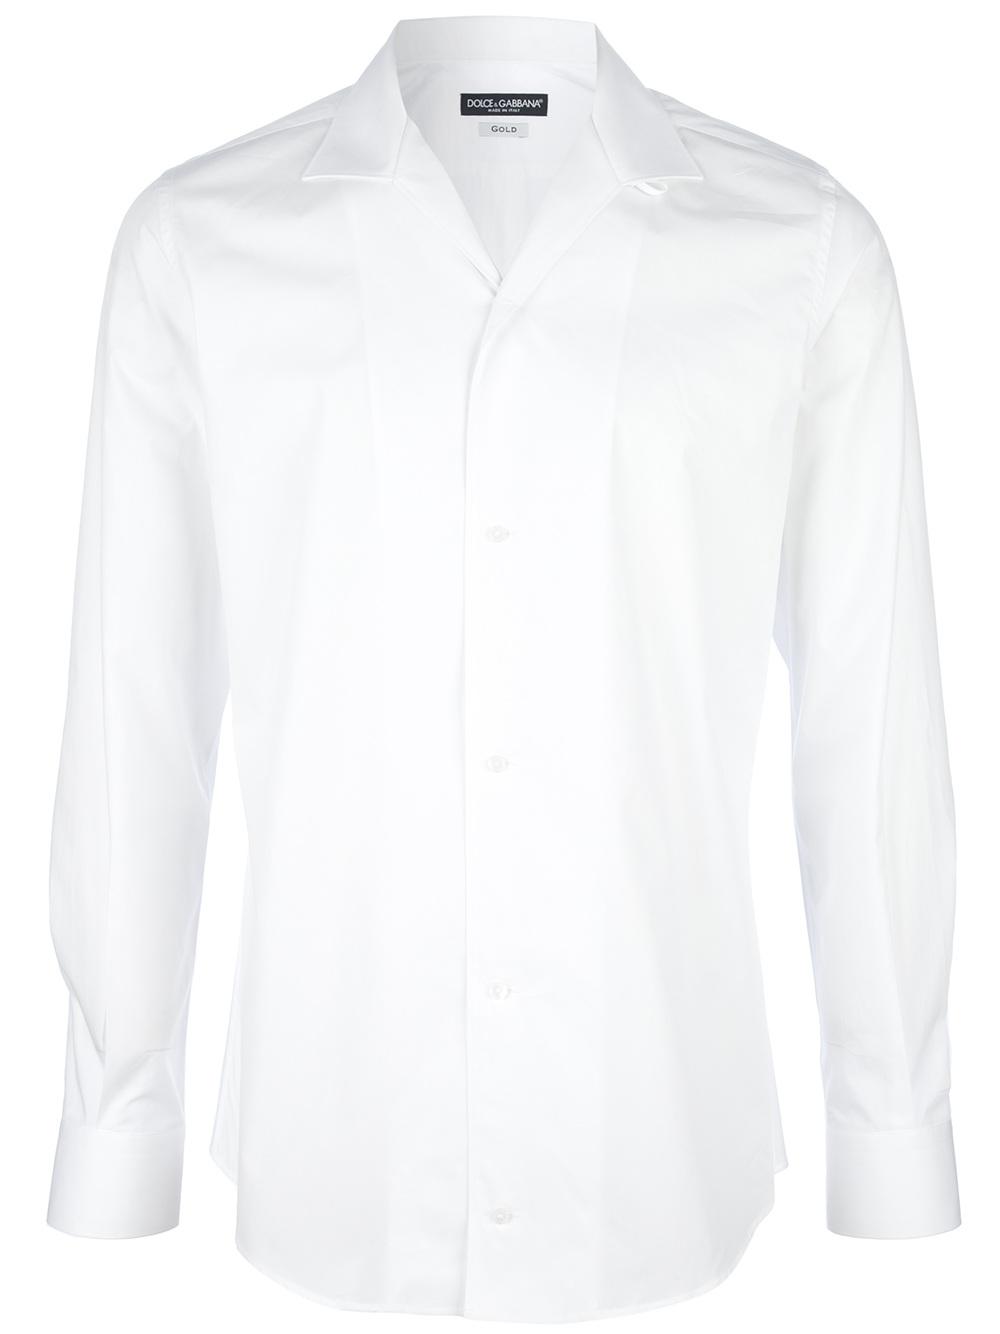 Dolce Amp Gabbana Open Collar Shirt In White For Men Lyst